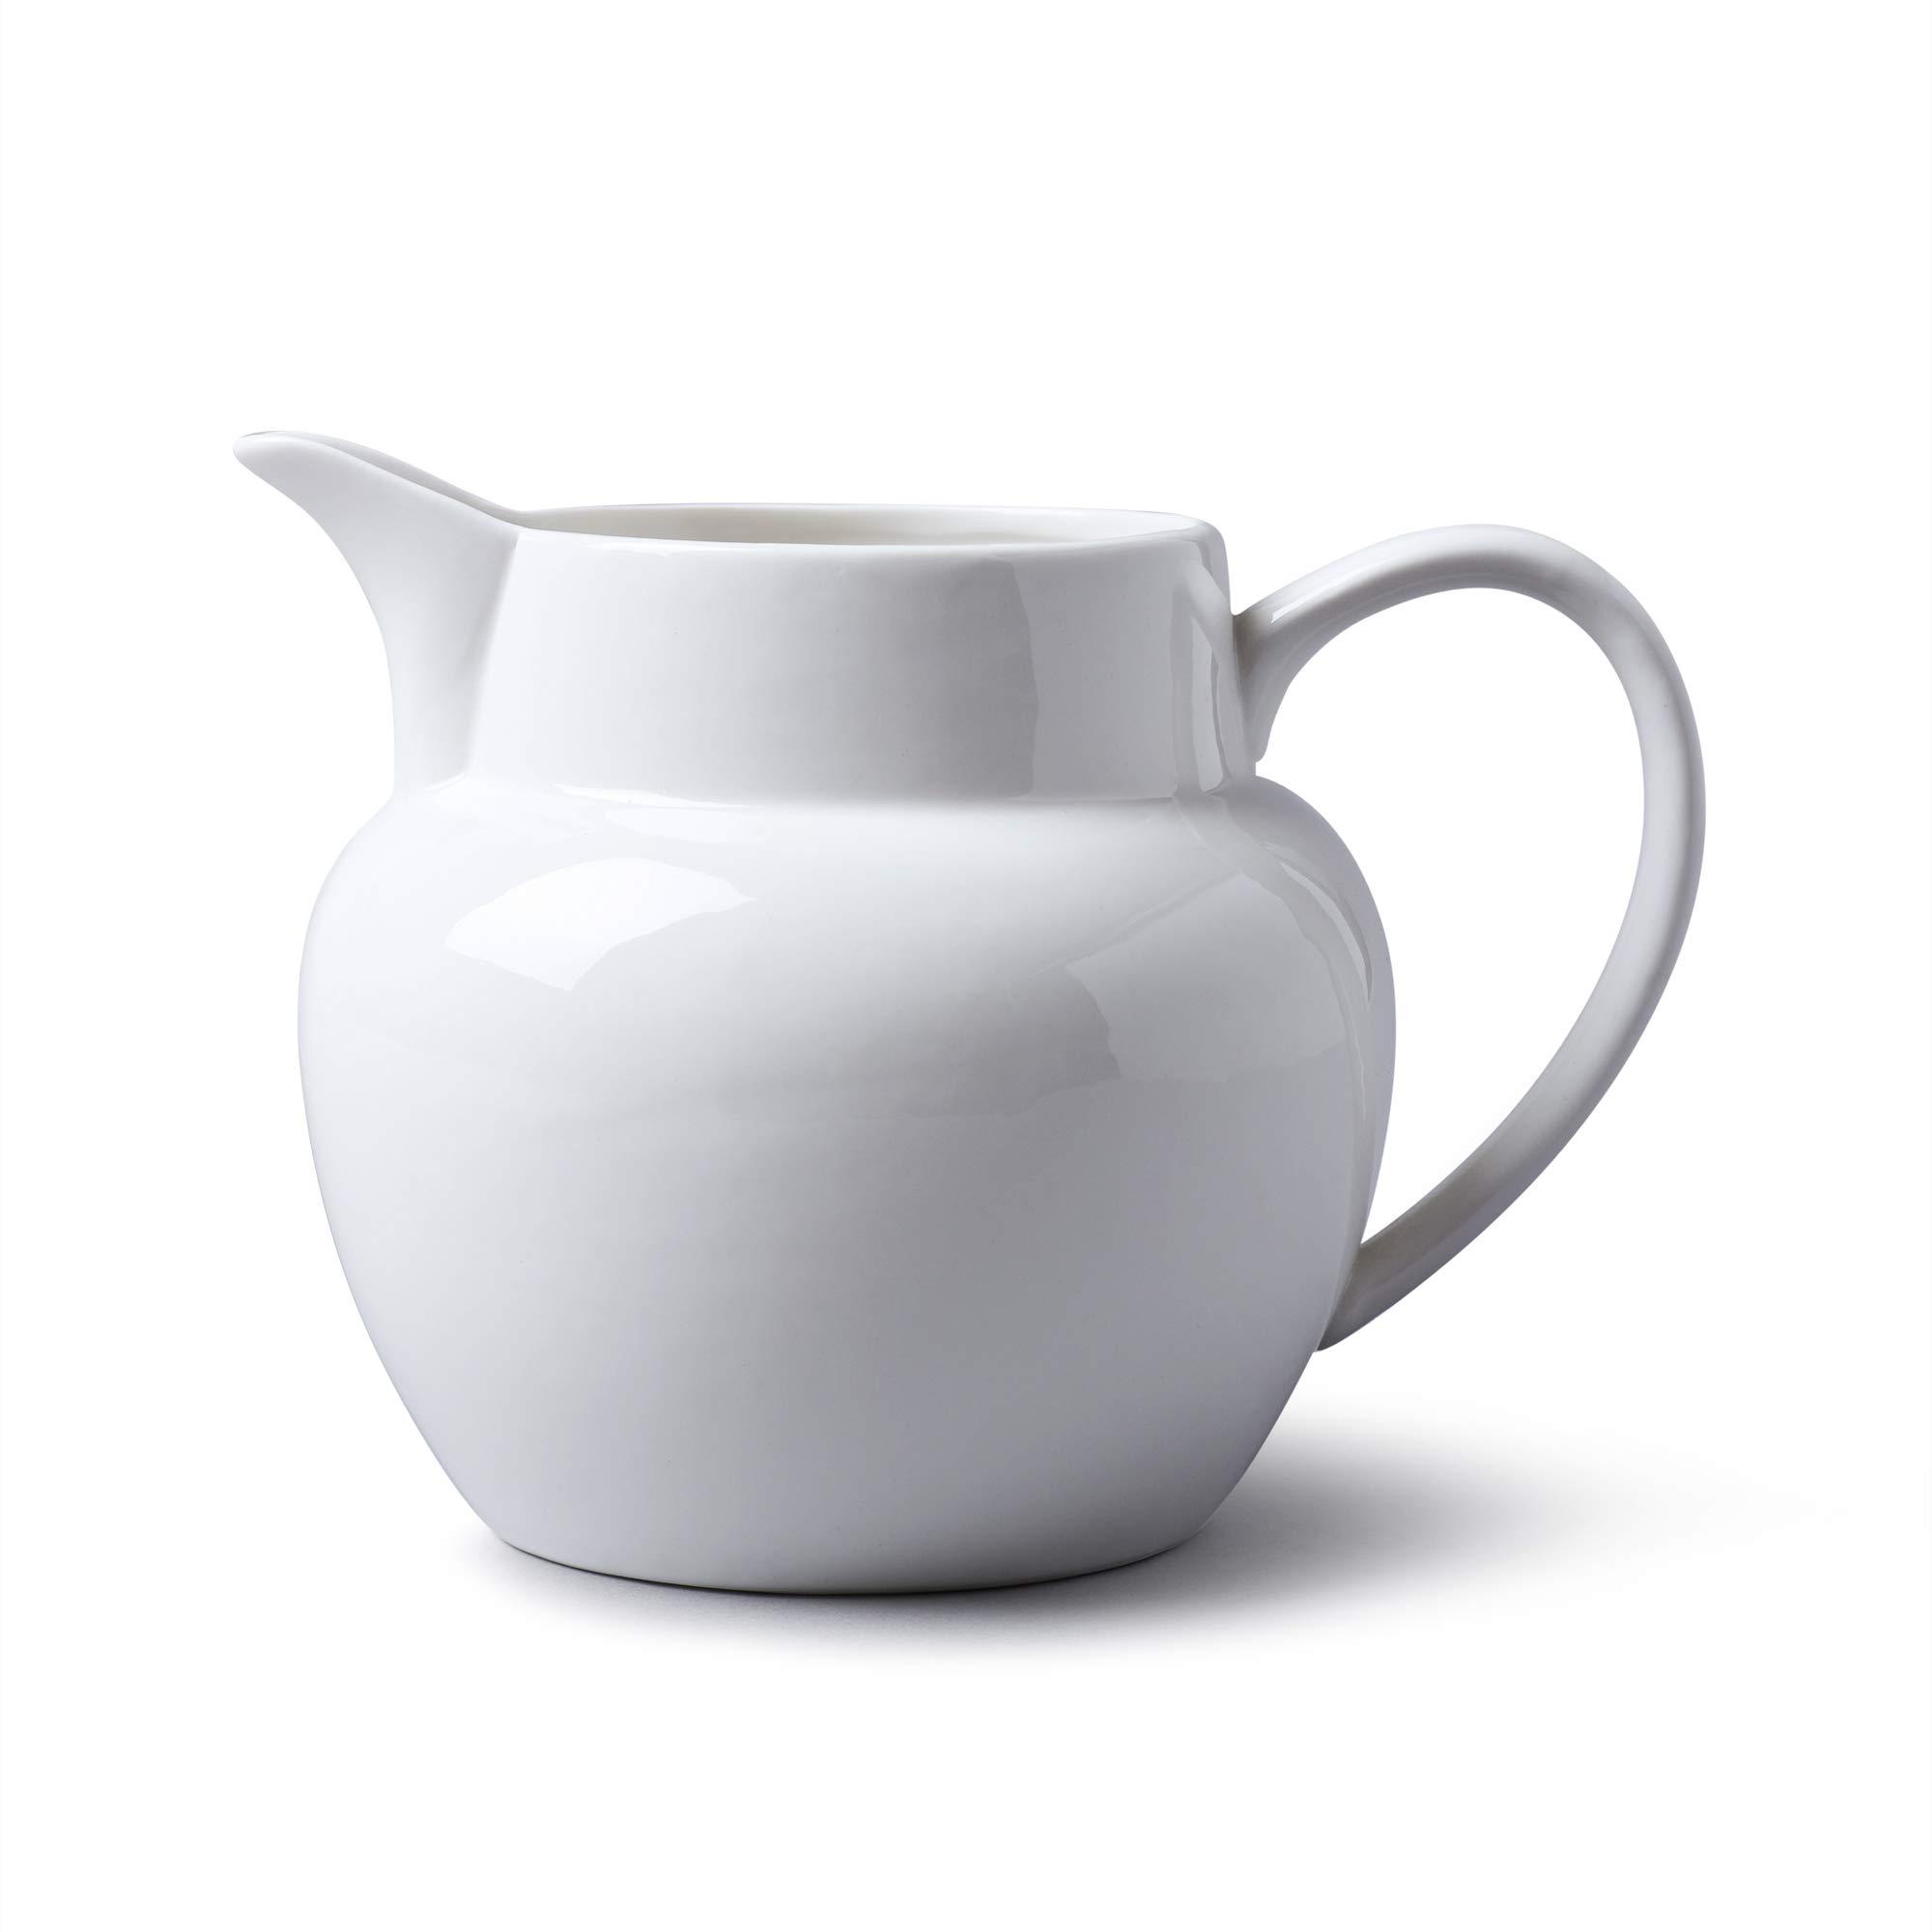 WM Bartleet & Sons 1750 T427 Porcelain Traditional Bellied Jug 1 Litre, 1000 ml, 1¼ Pint-White